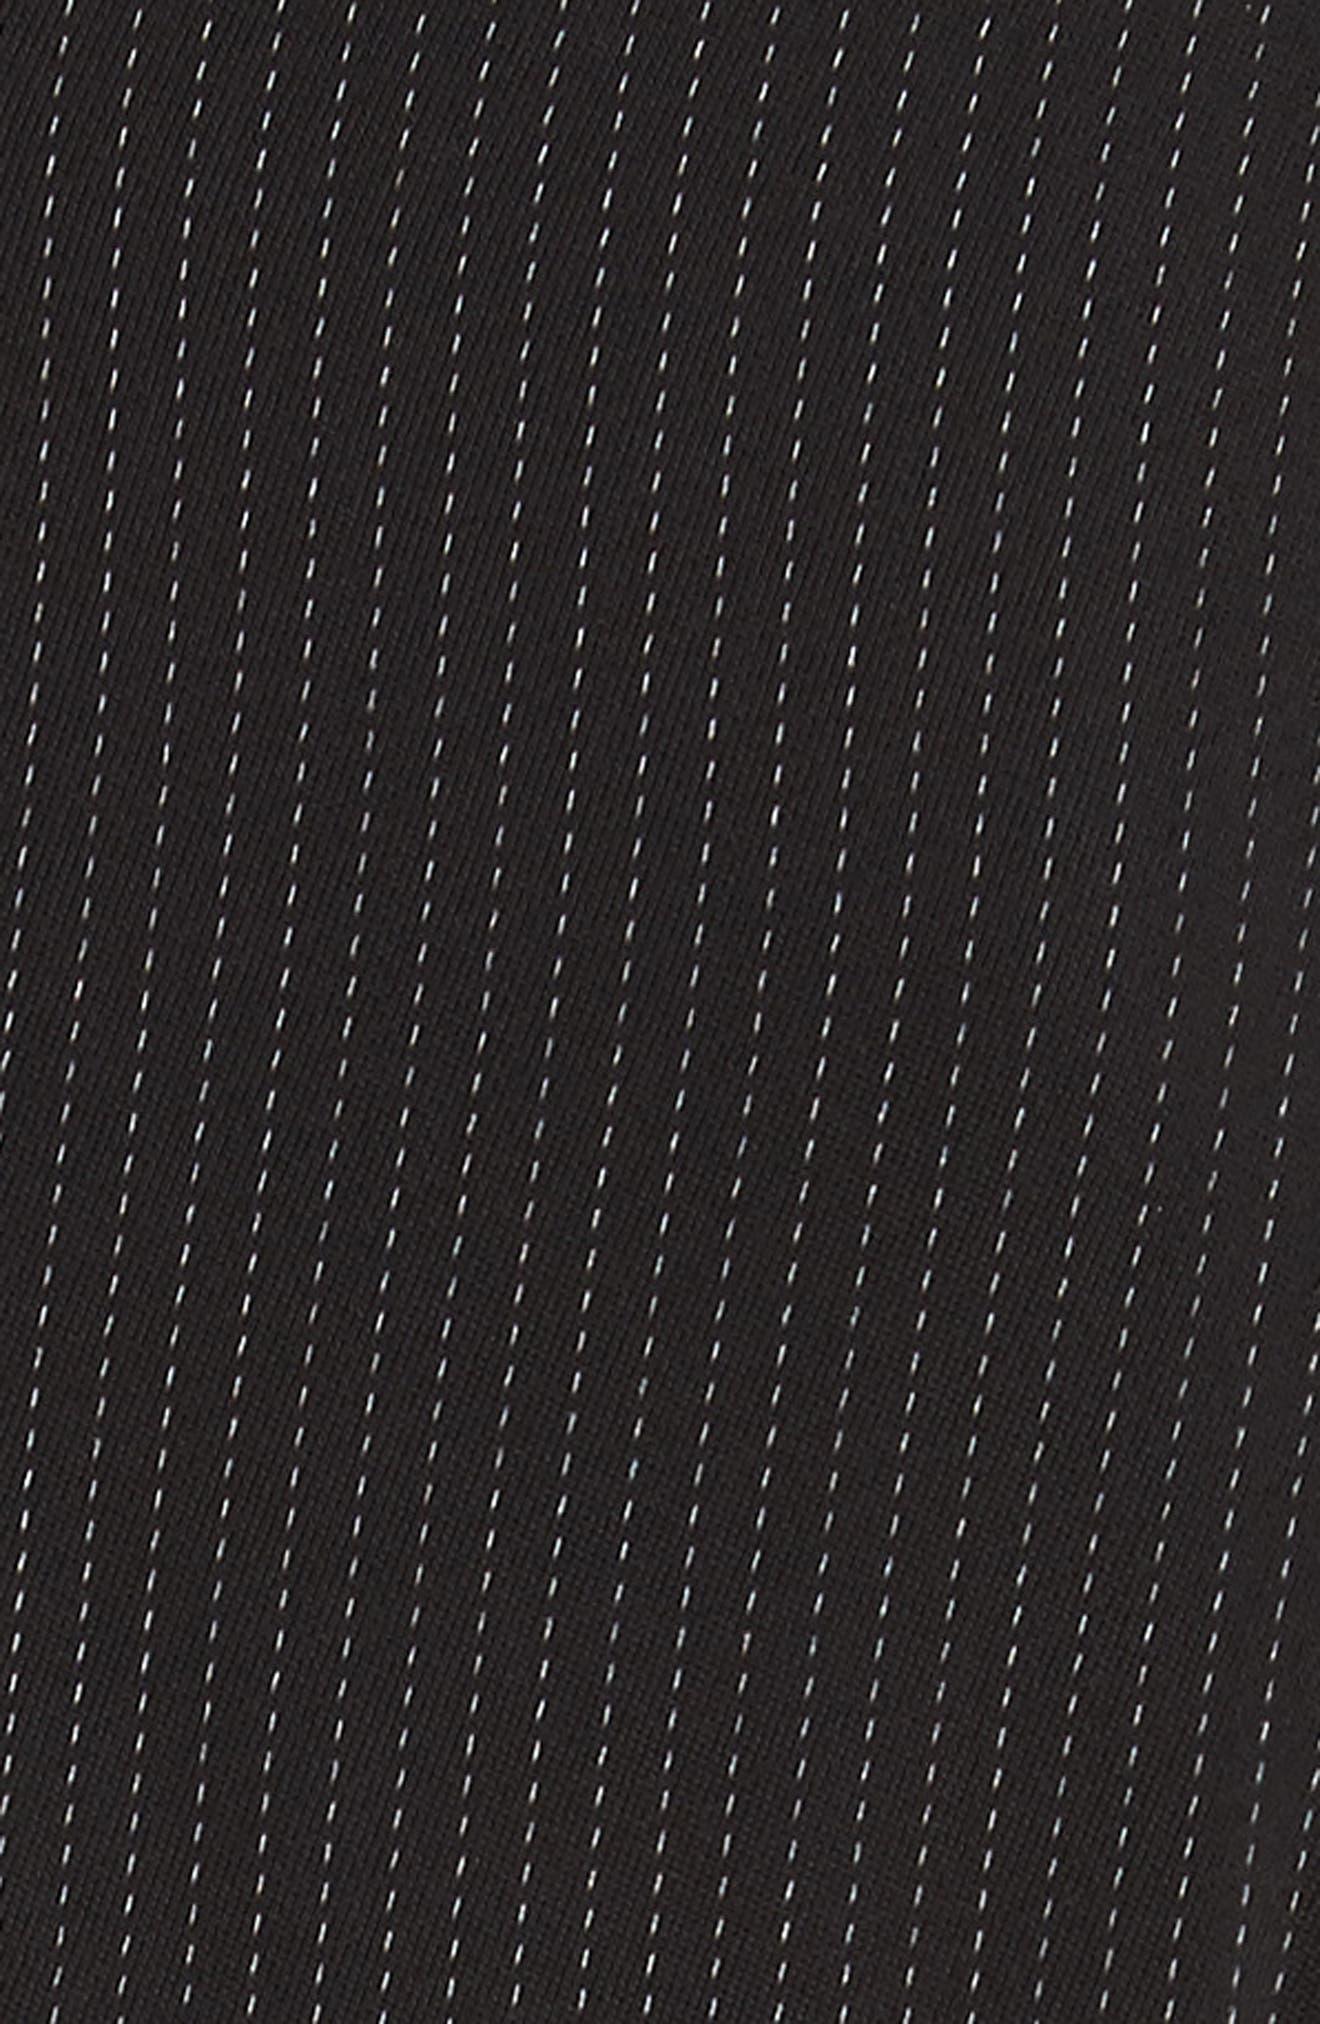 Pinstripe Jersey Sheath Dress,                             Alternate thumbnail 6, color,                             Black / Chalk